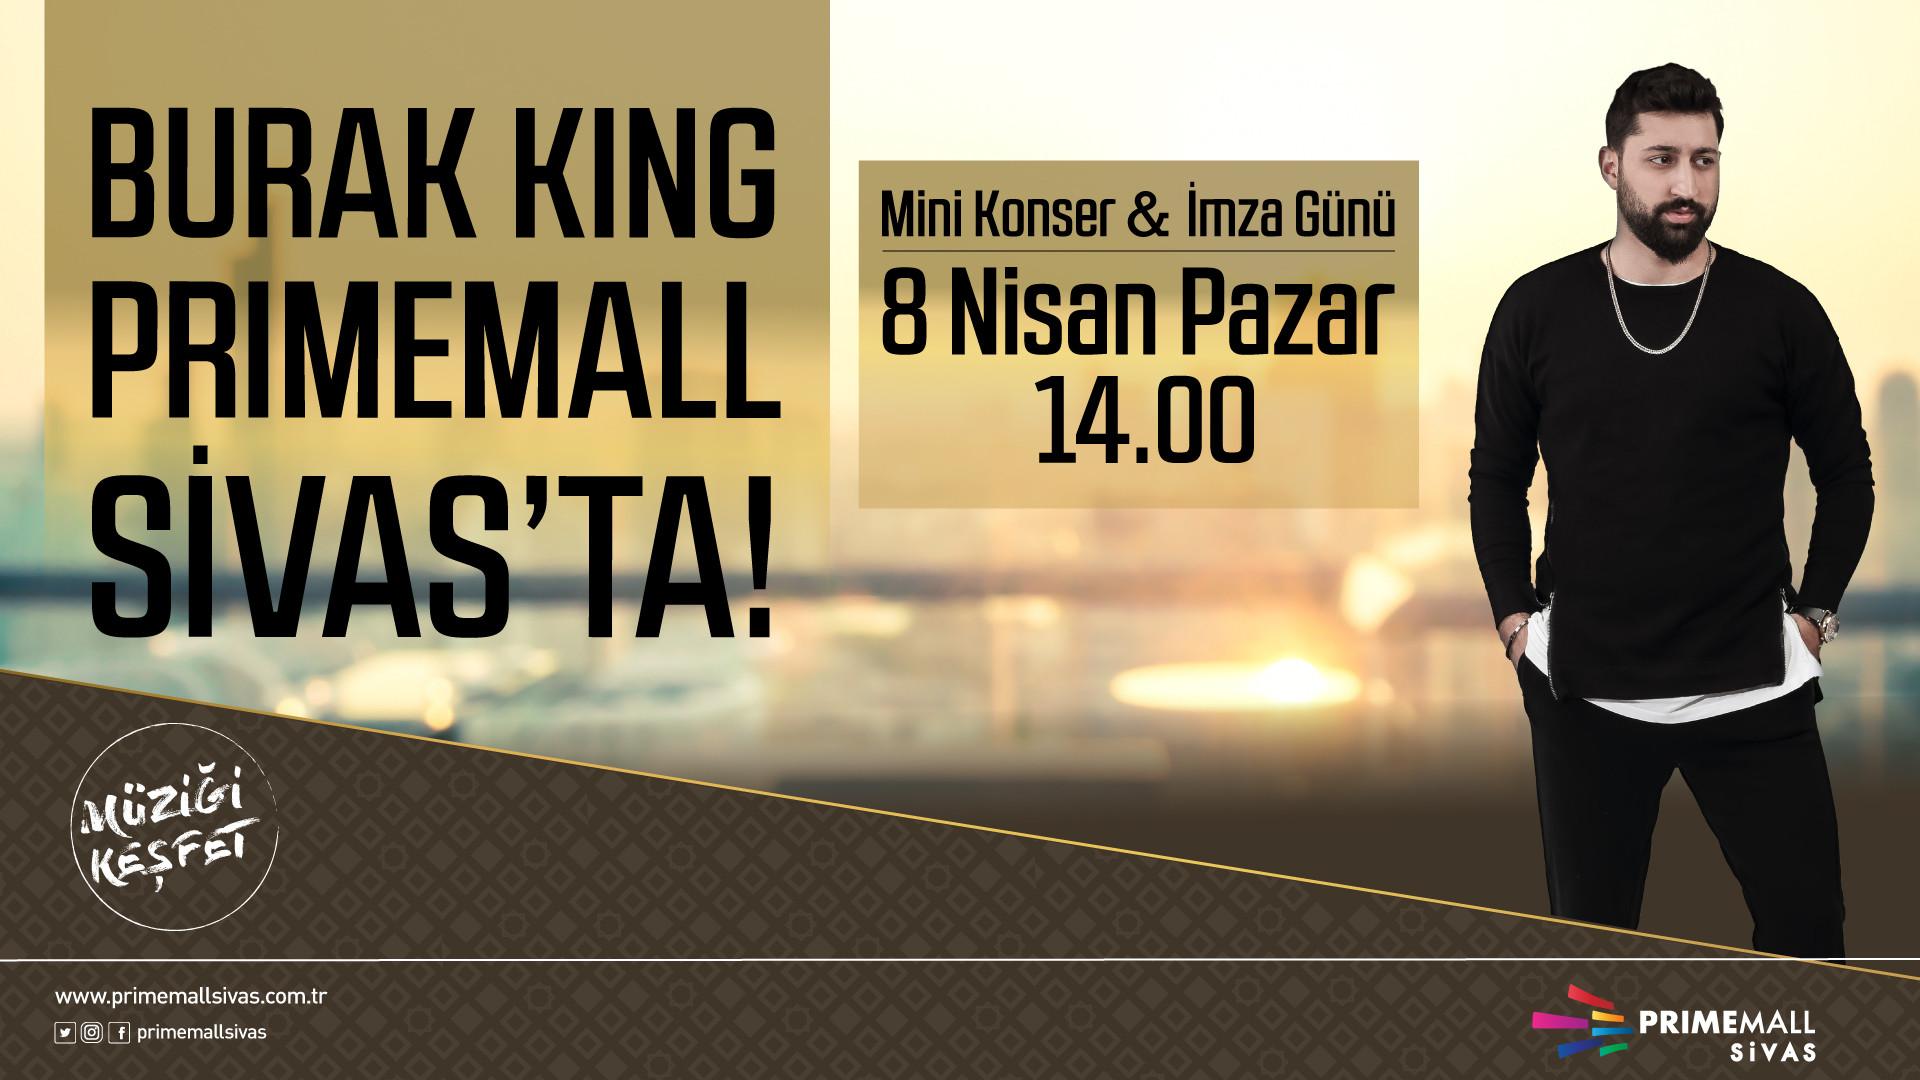 Burak King Primemall Sivas'ta!